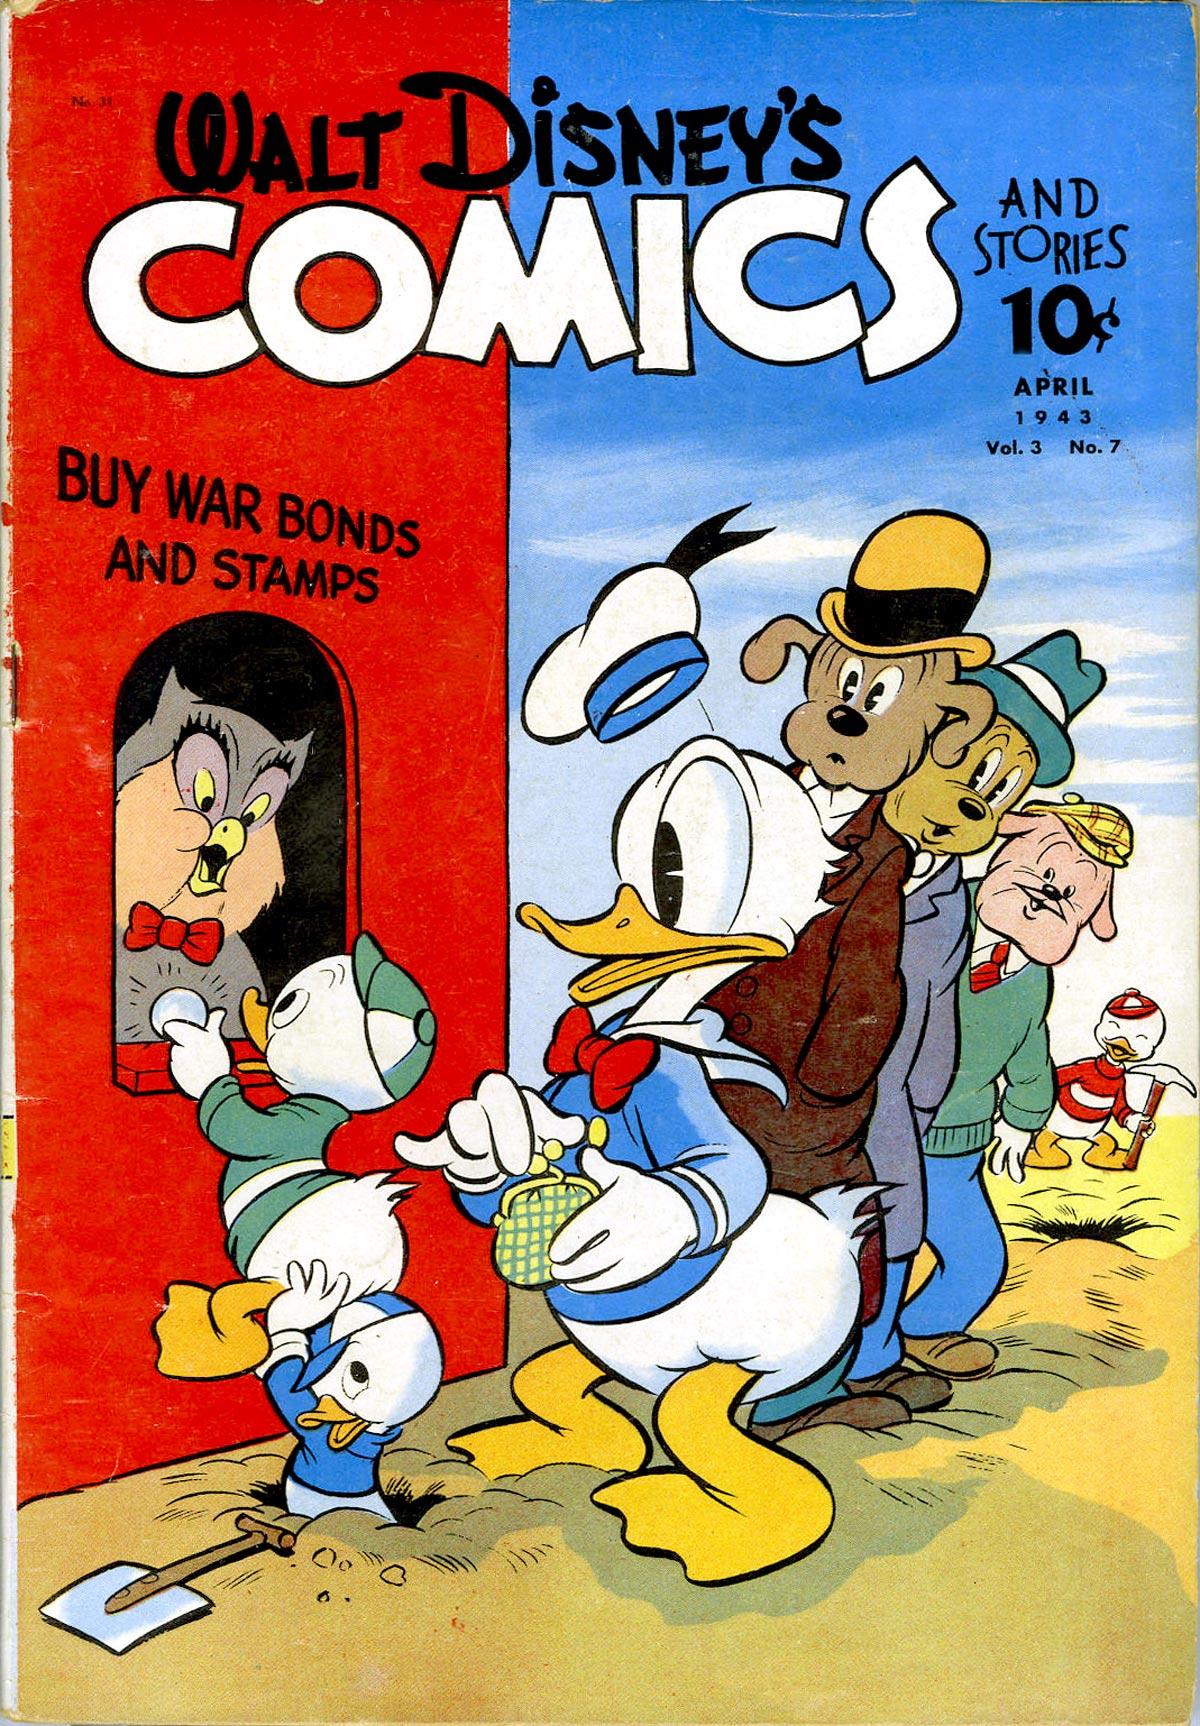 Walt Disneys Comics and Stories 31 Page 1